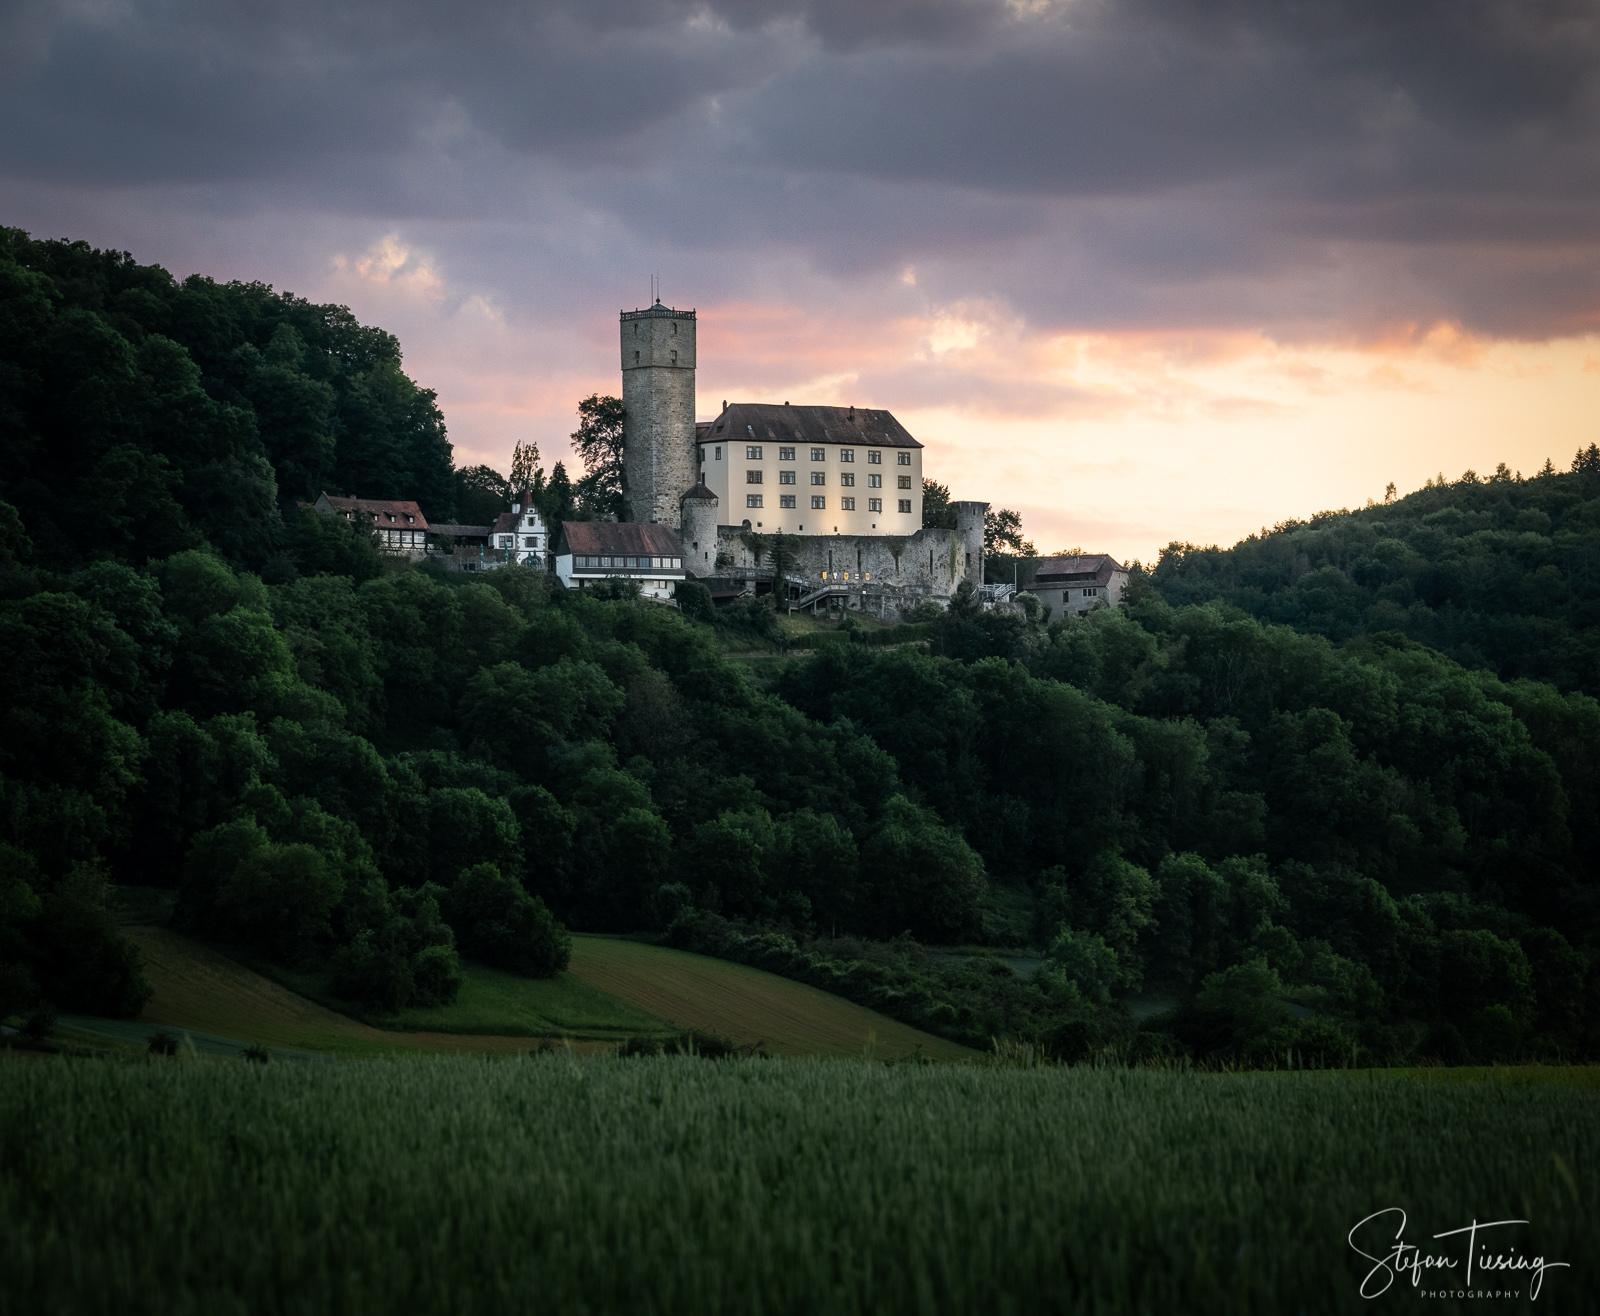 Burg Guttenberg, long distance view, Germany